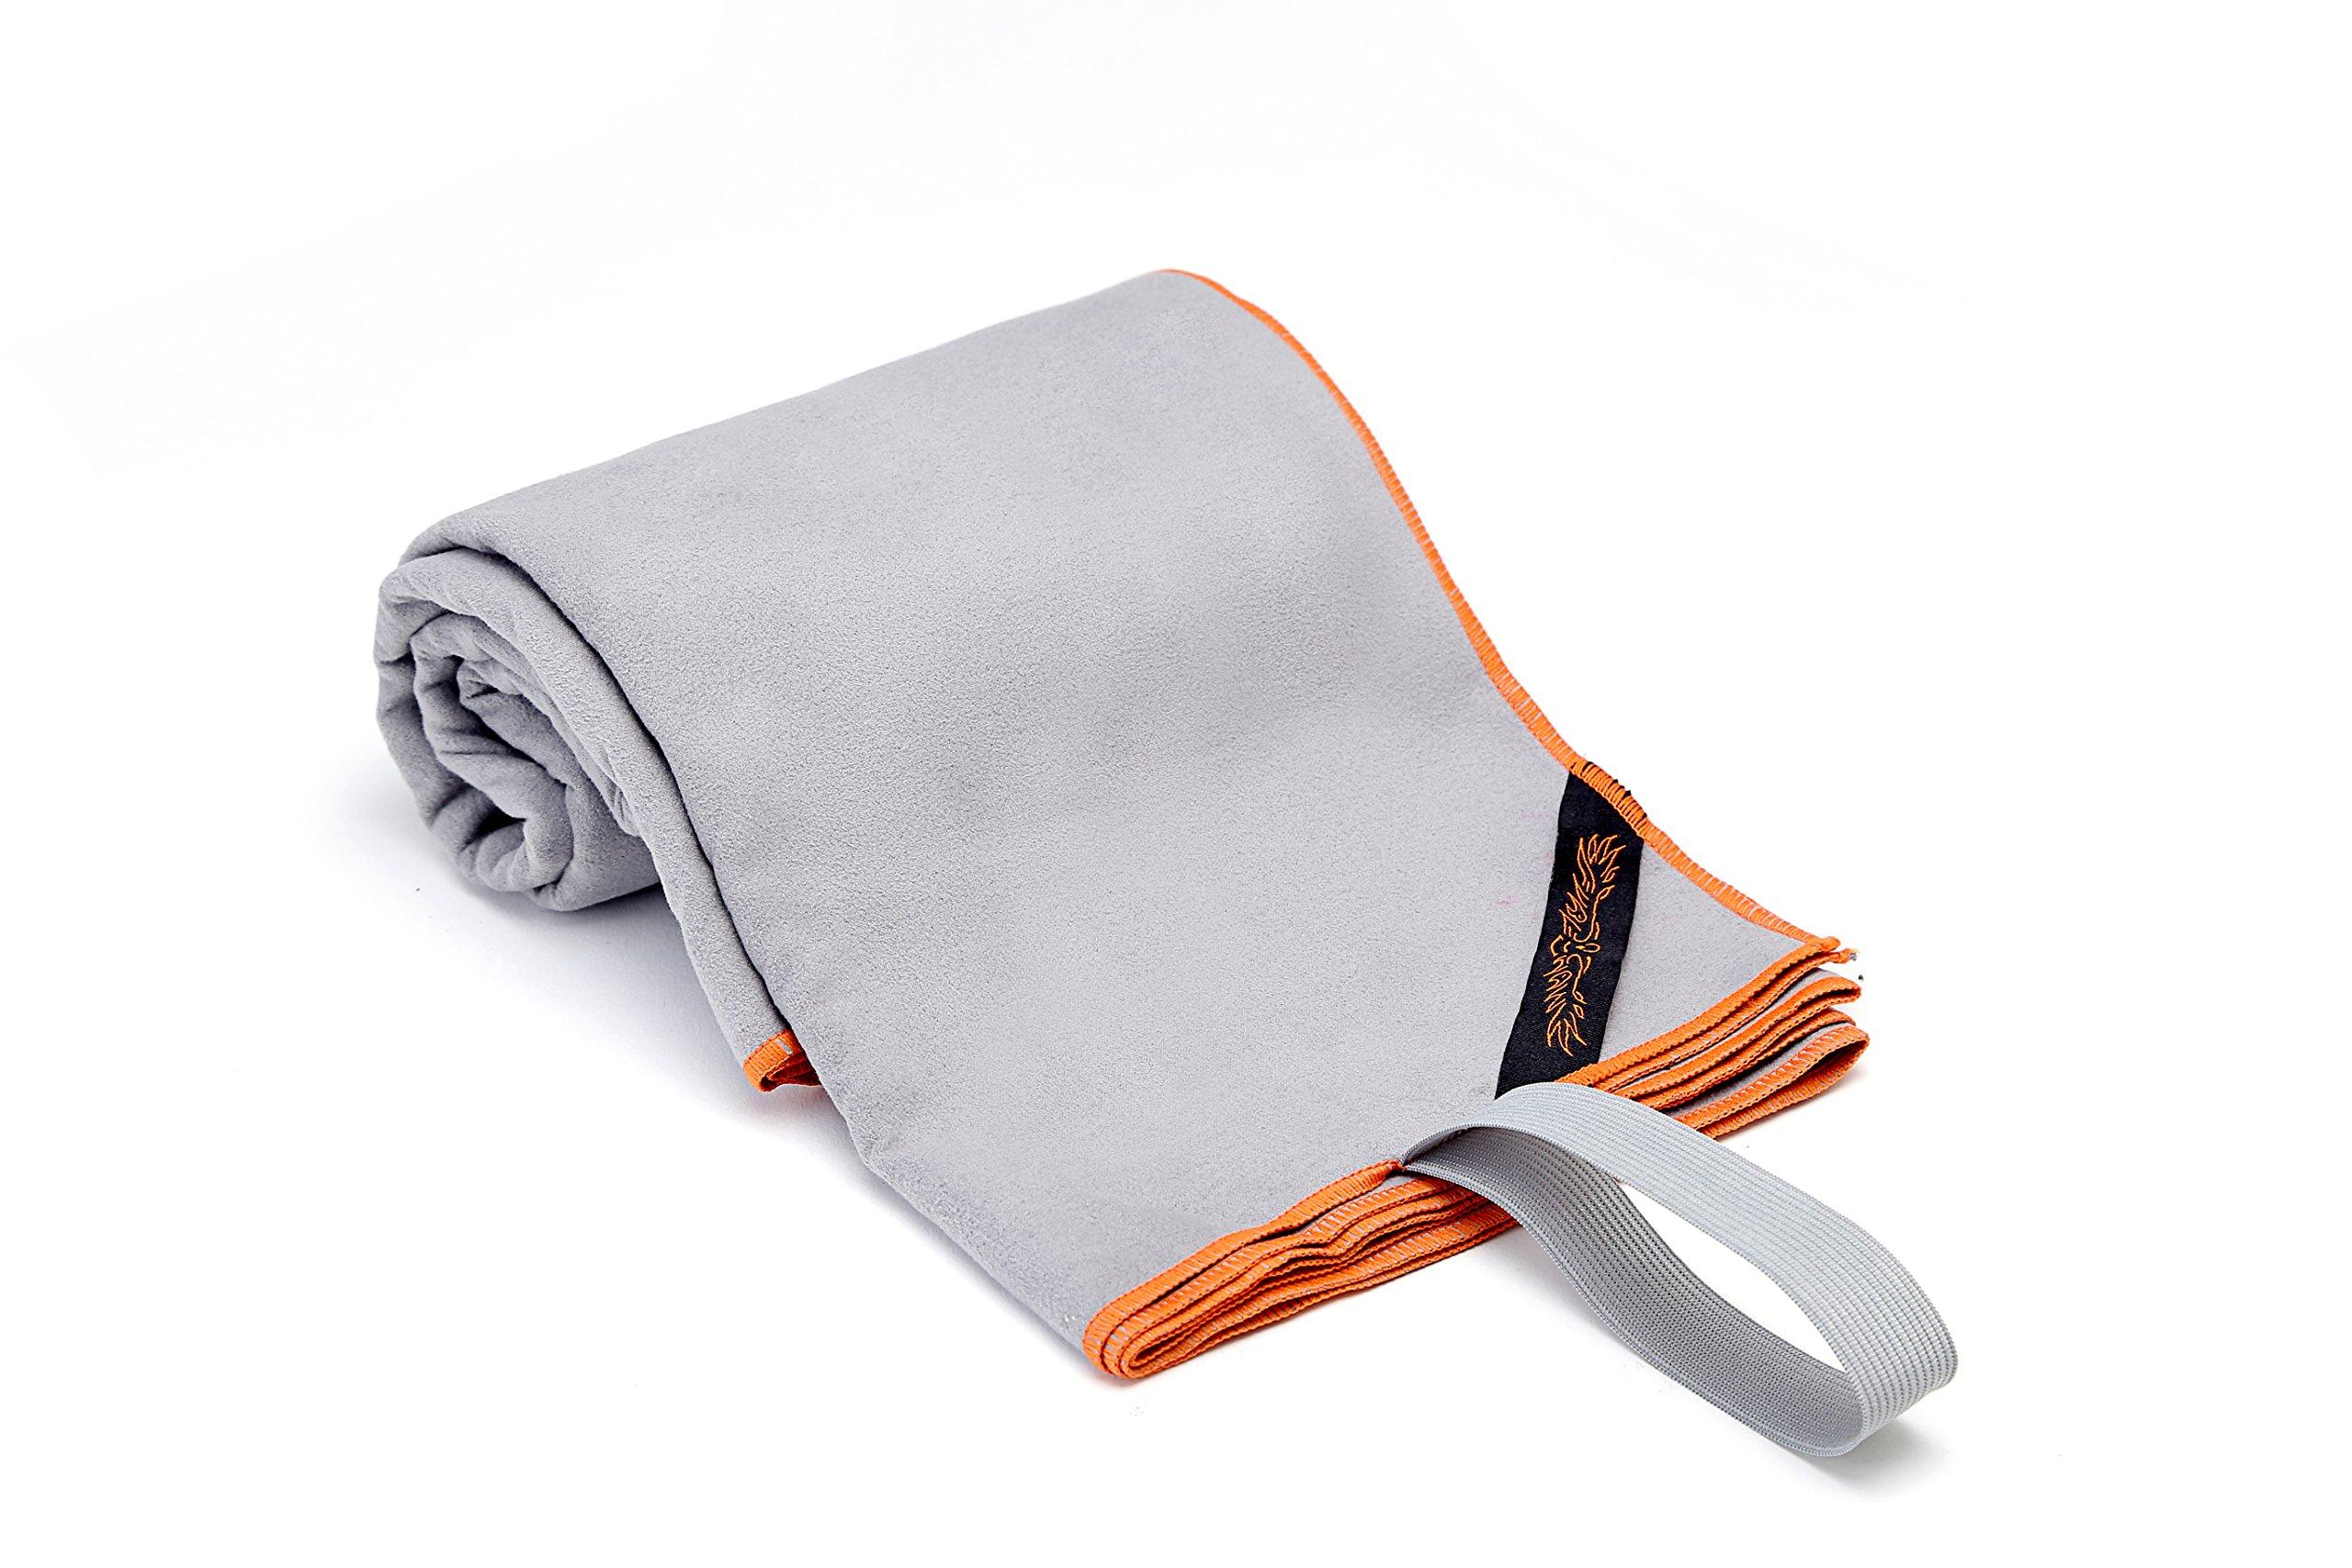 Microfiber Quick Drying Towel for Gym, Swim, Yoga, or Travel (Gray)